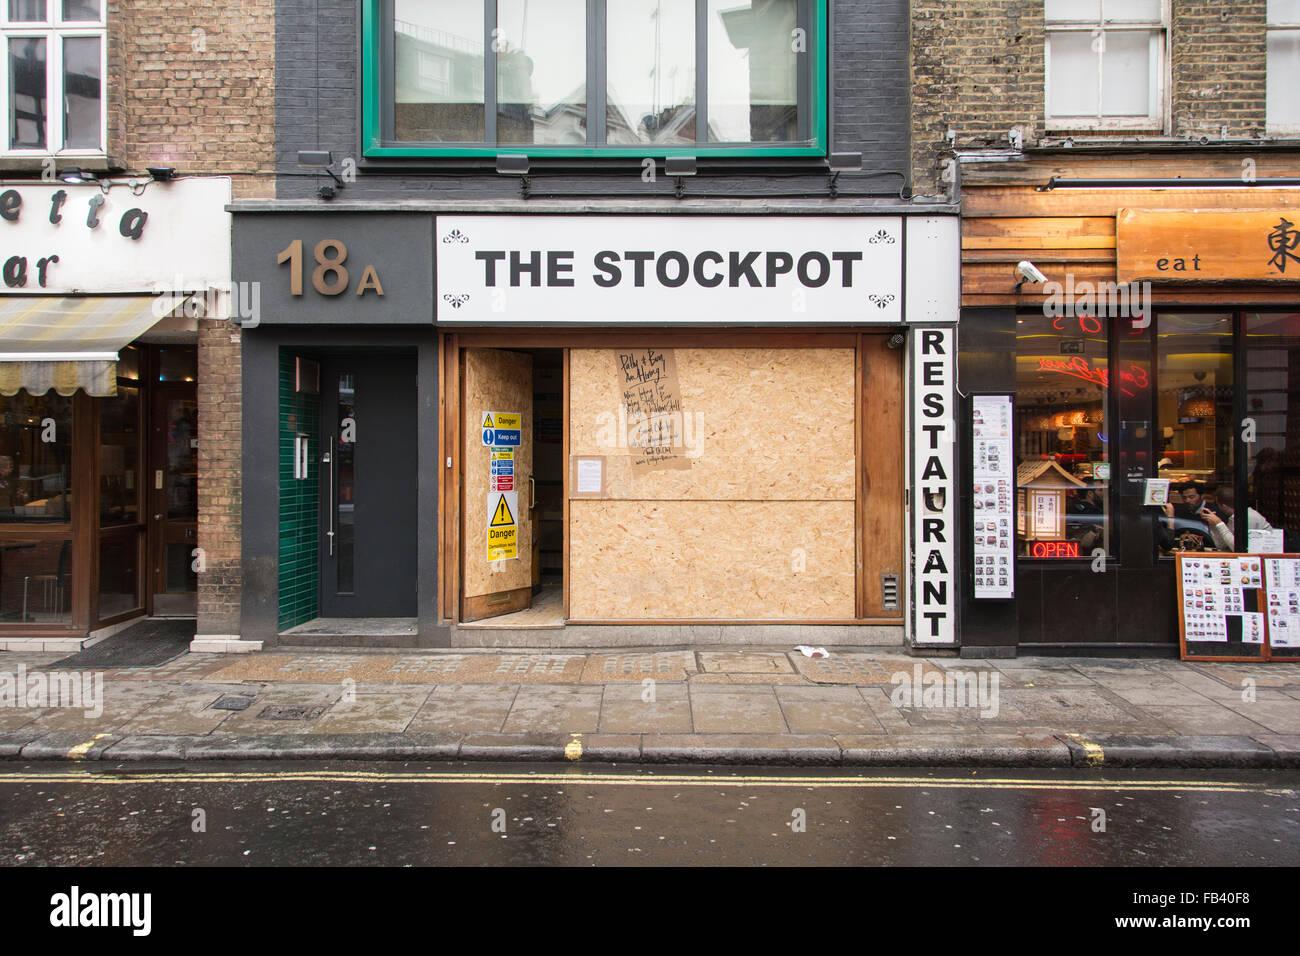 Exterior of the former Stockpot restaurant in SOHO, London, UK Stock Photo